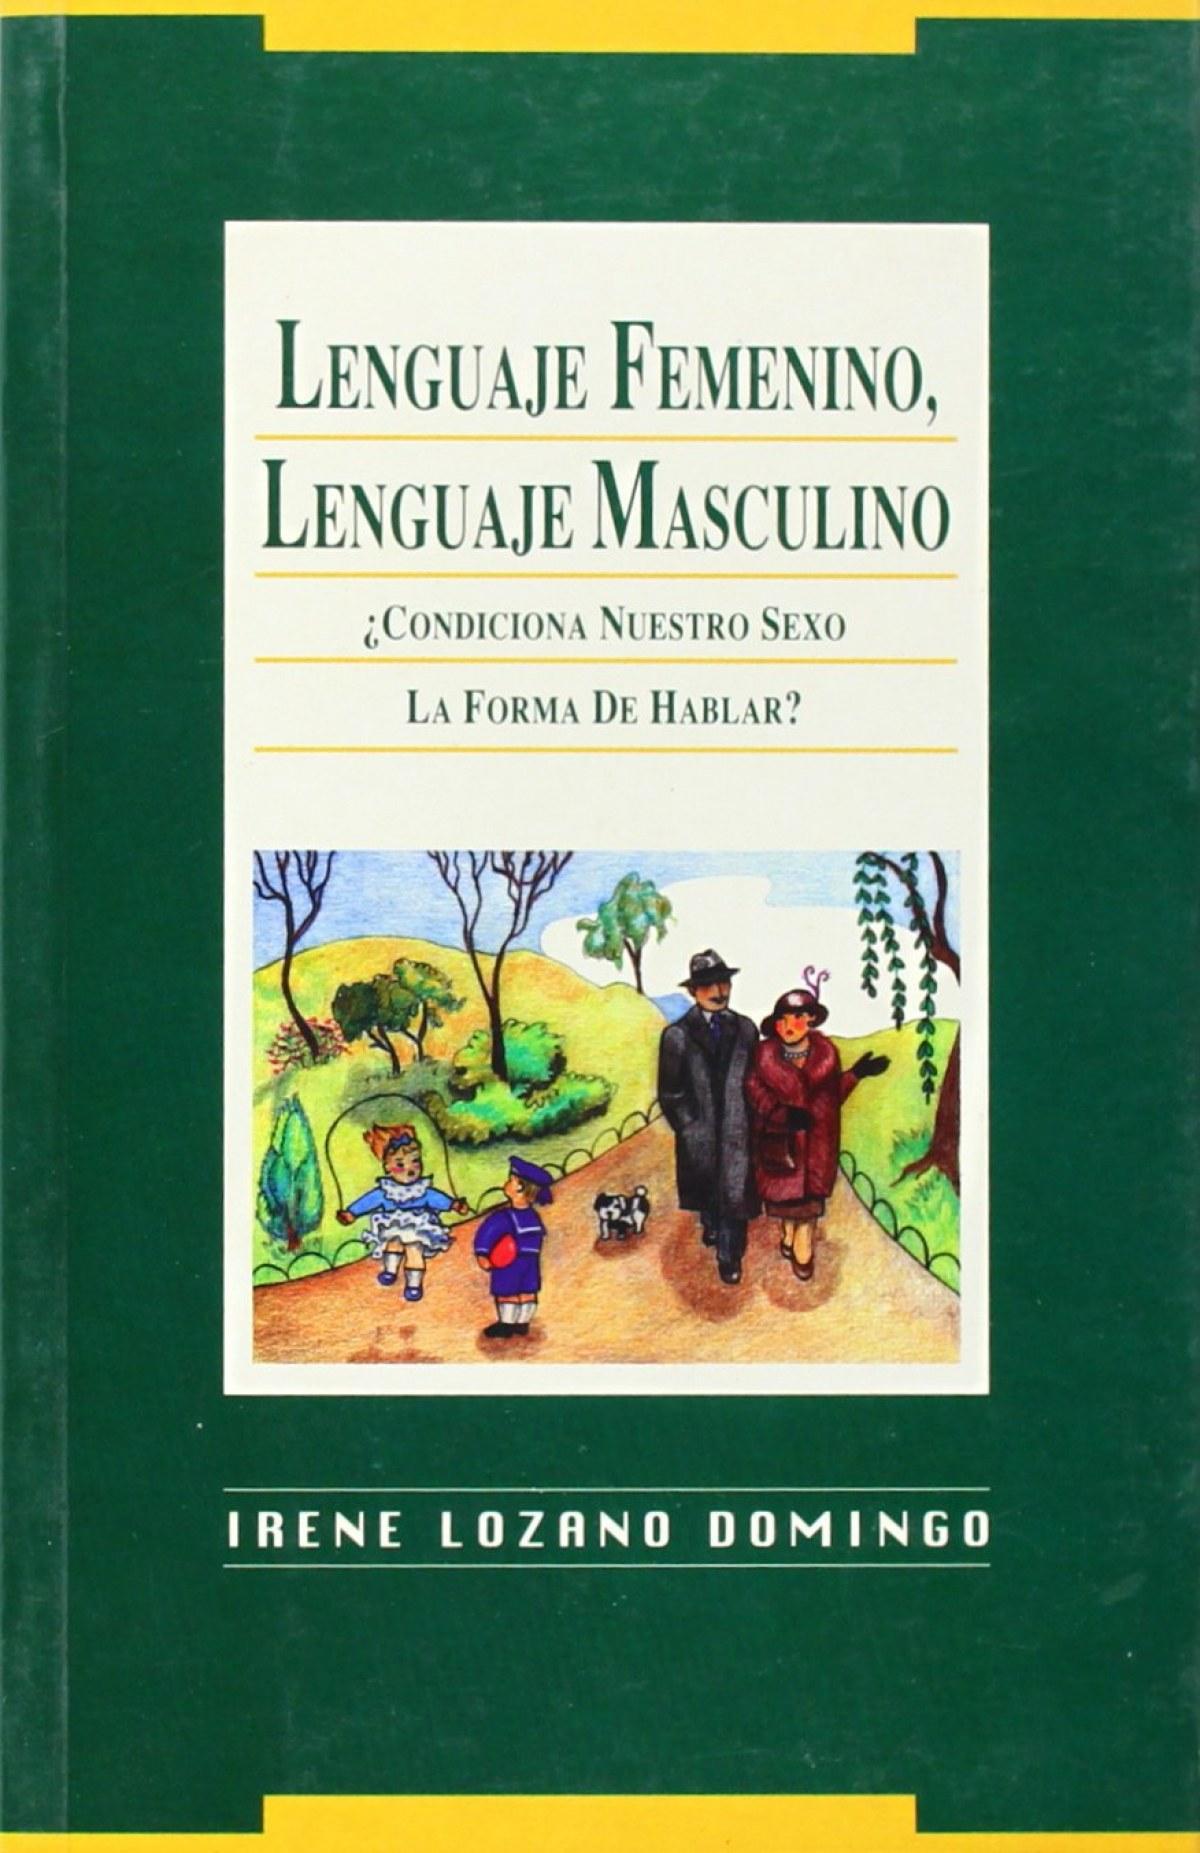 LENGUAJE FEMENINO LENGUAJE MASCULINO